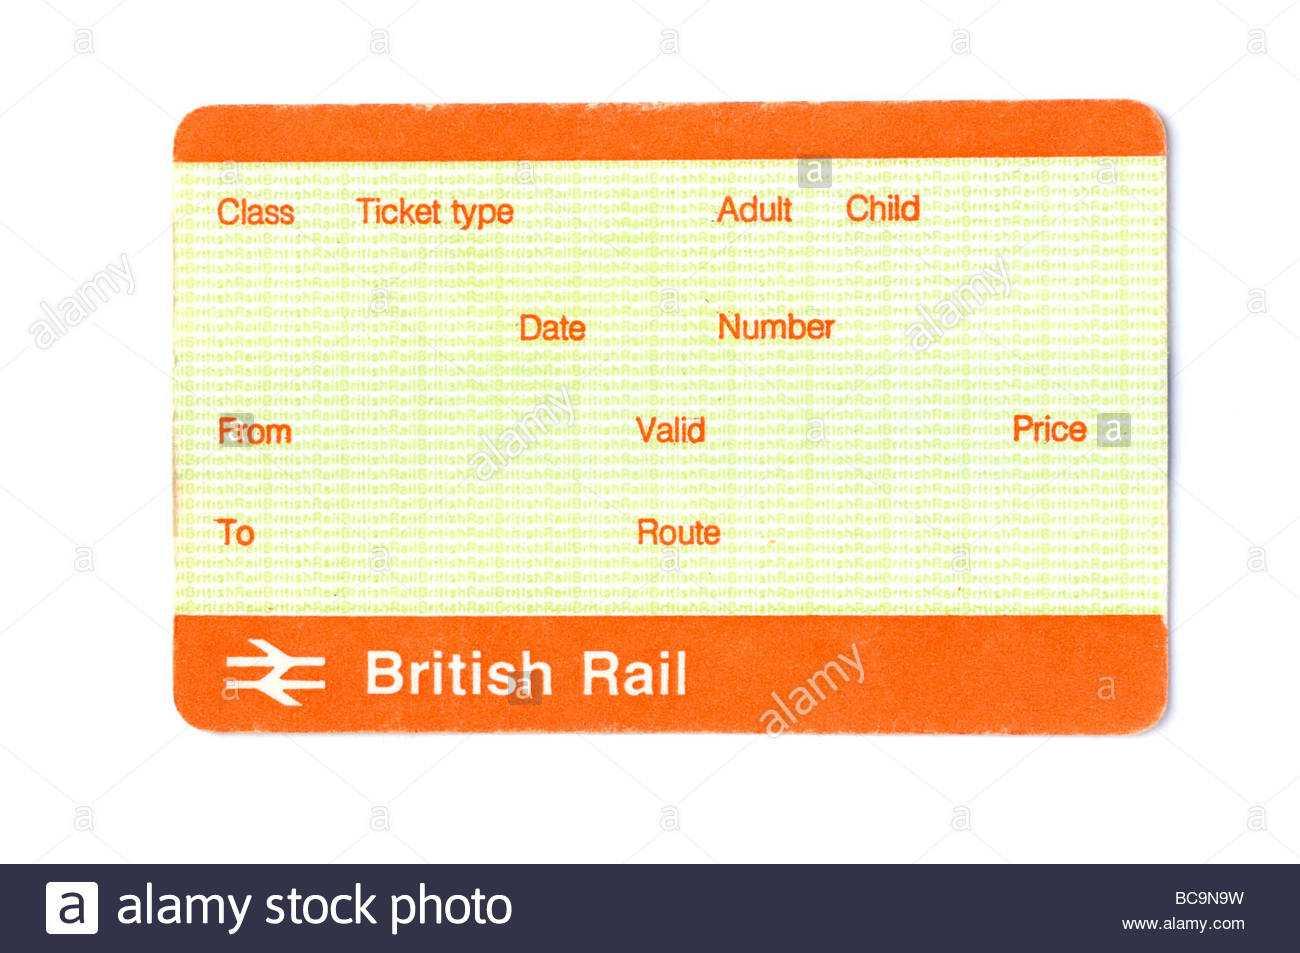 Train Ticket Blank Stock Photos & Train Ticket Blank Stock Throughout Blank Train Ticket Template